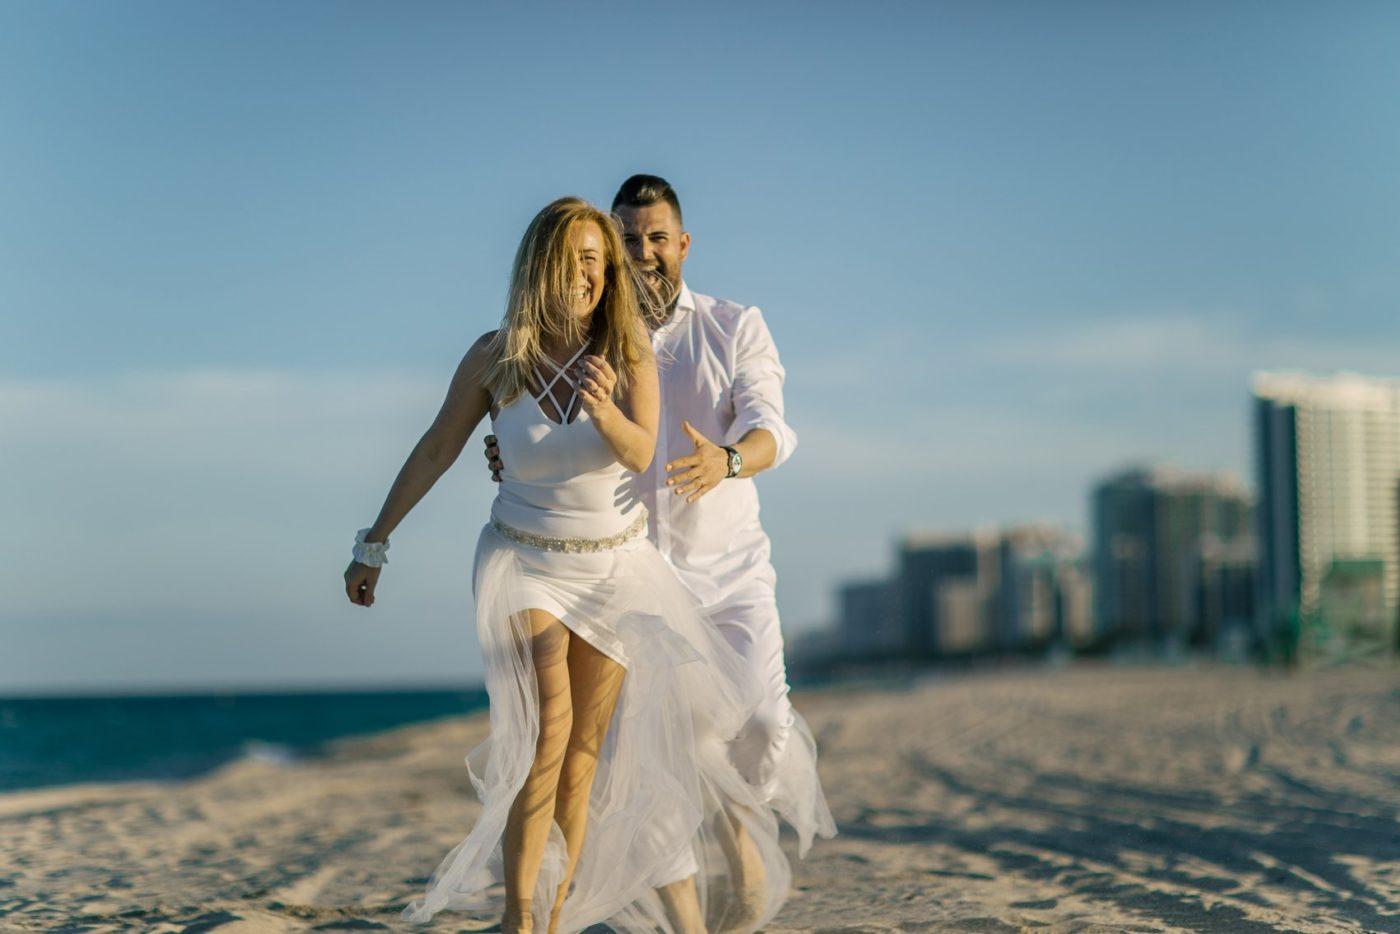 tengerparti esküvő csomag